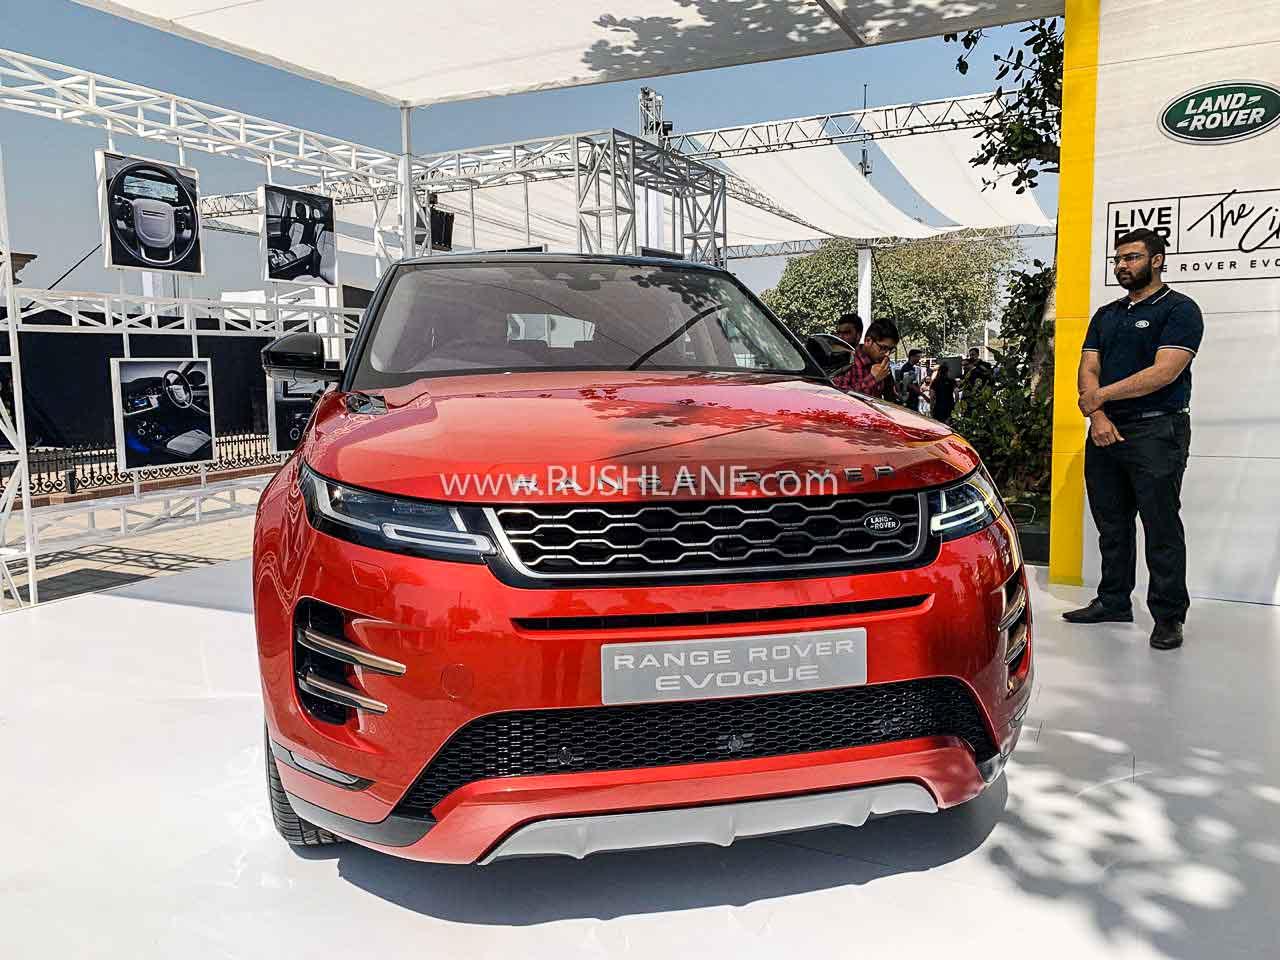 2020 Range Rover Evoque BS6